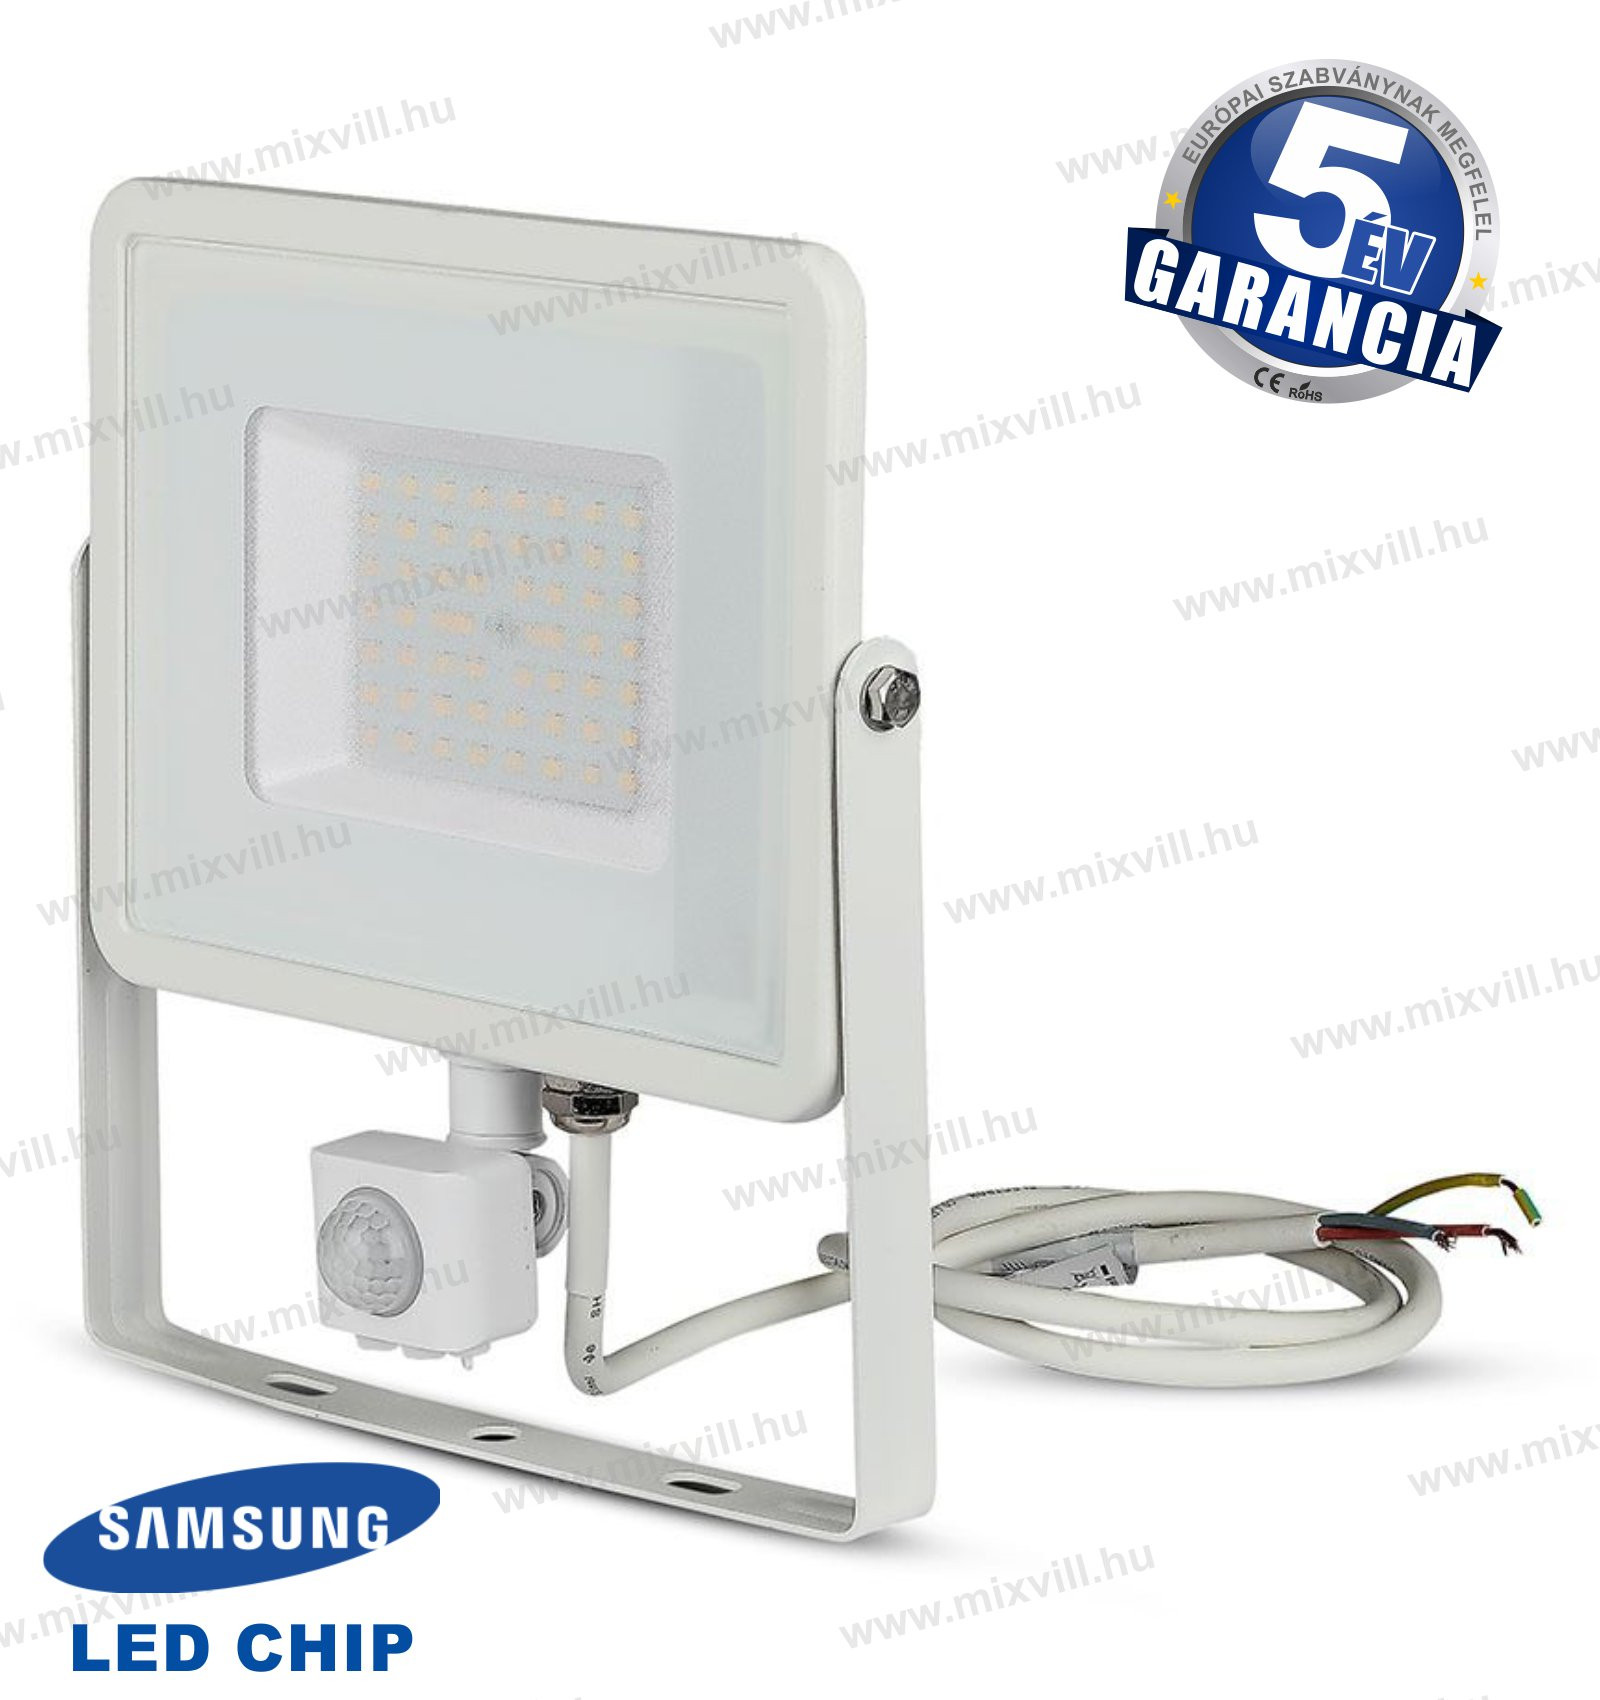 V-TAC-SKU-467-mozgaserzekelos-LED-reflektor-50W-4000K-feher-Samsung-chip